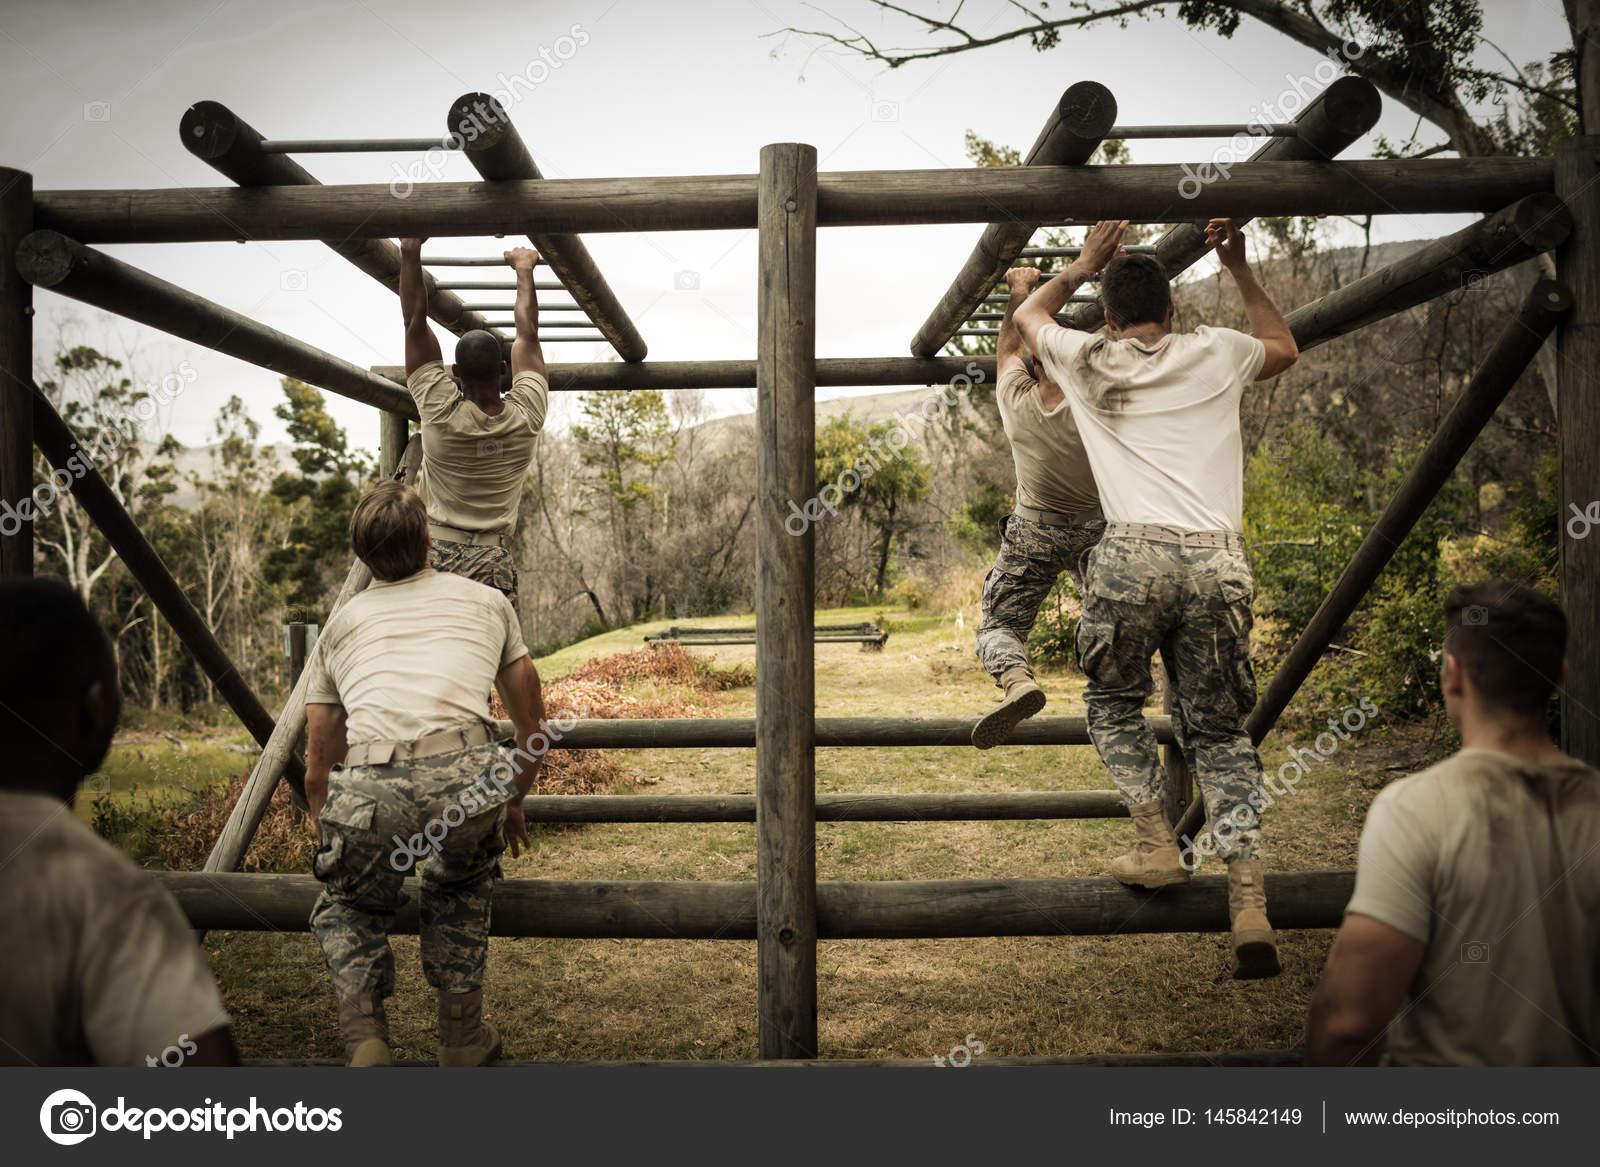 Little Monkey Klettergerüst : Soldaten klettern klettergerüst u stockfoto wavebreakmedia